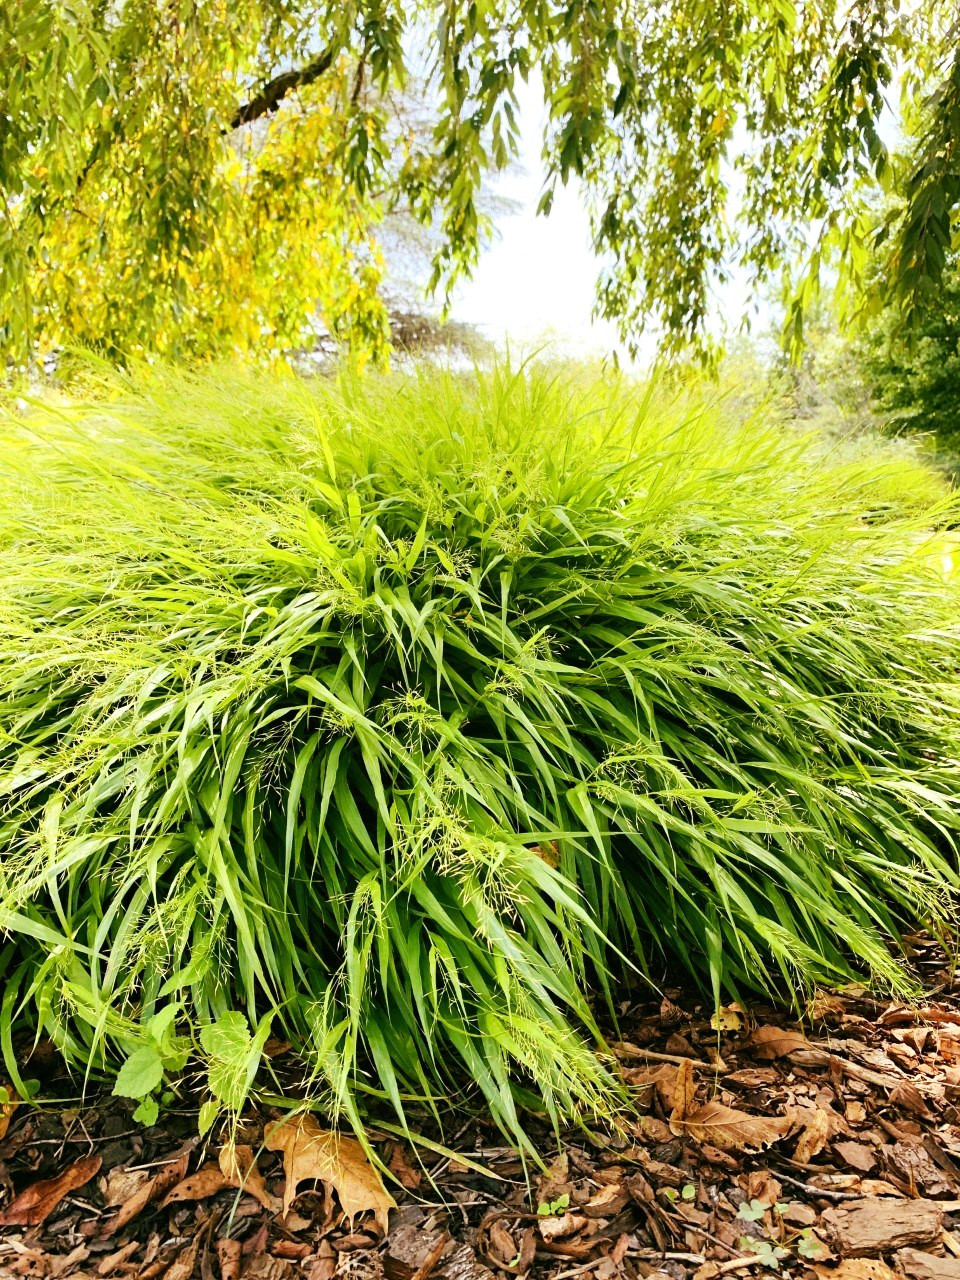 Hakonechloa macra 'Aureola' in dappled shade. https://plants.ces.ncsu.edu/plants/hakonechloa-macra-aureola/